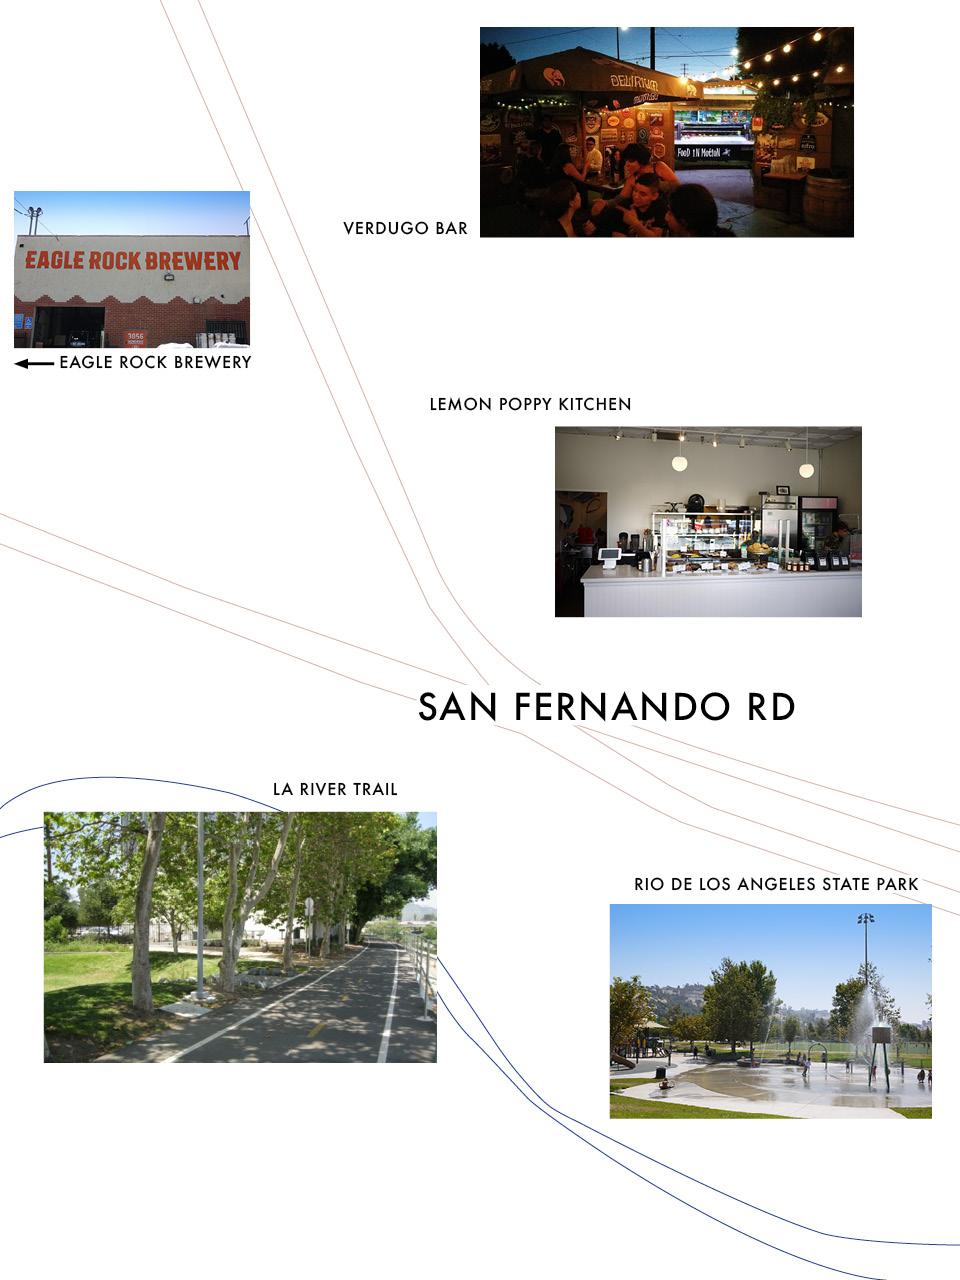 erb_neighborhood_page_images3.jpg